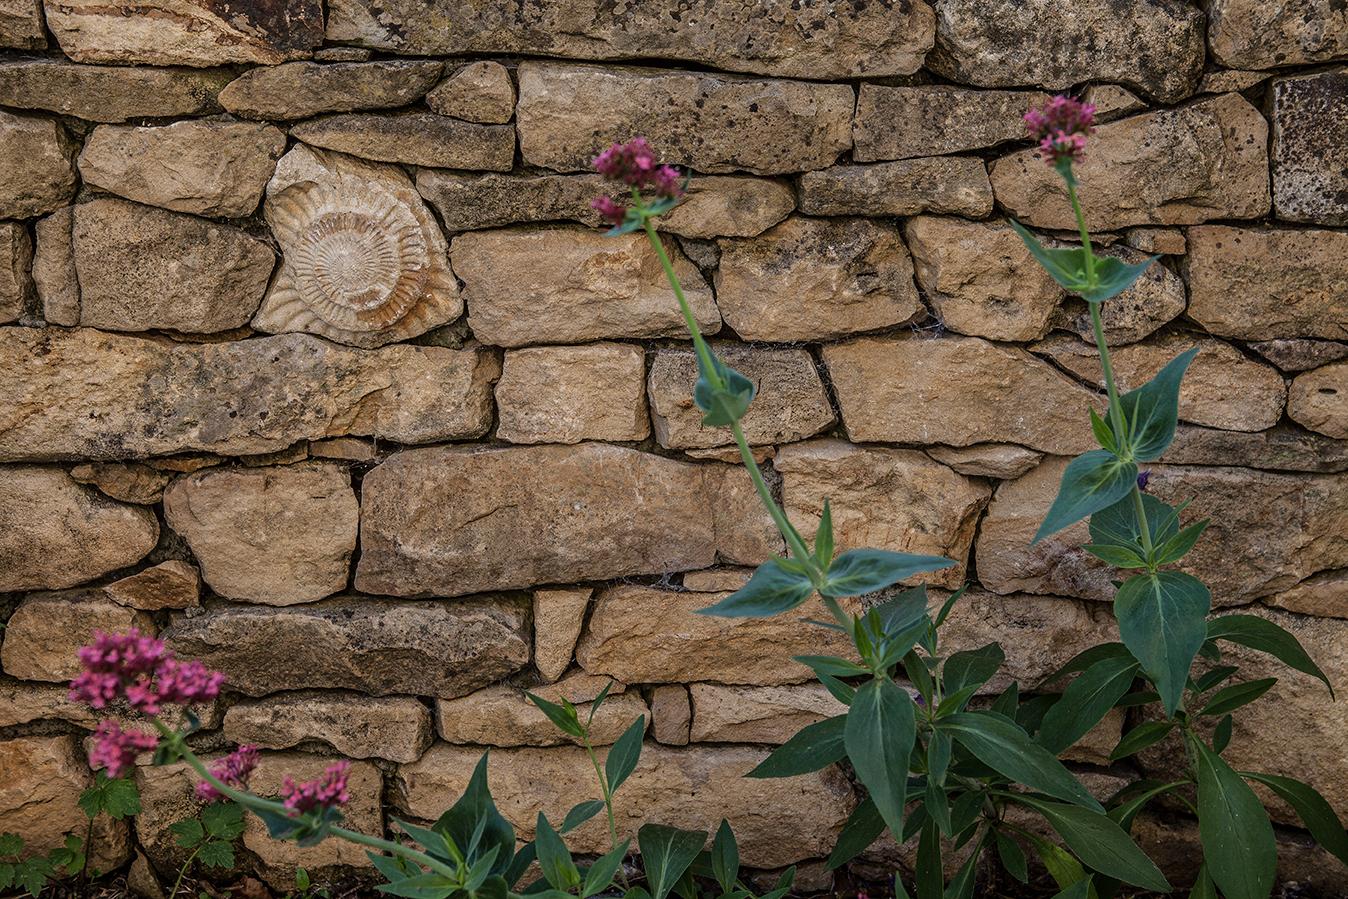 Realisation terrasse murets escalier allee jardin pierre recuperation 8